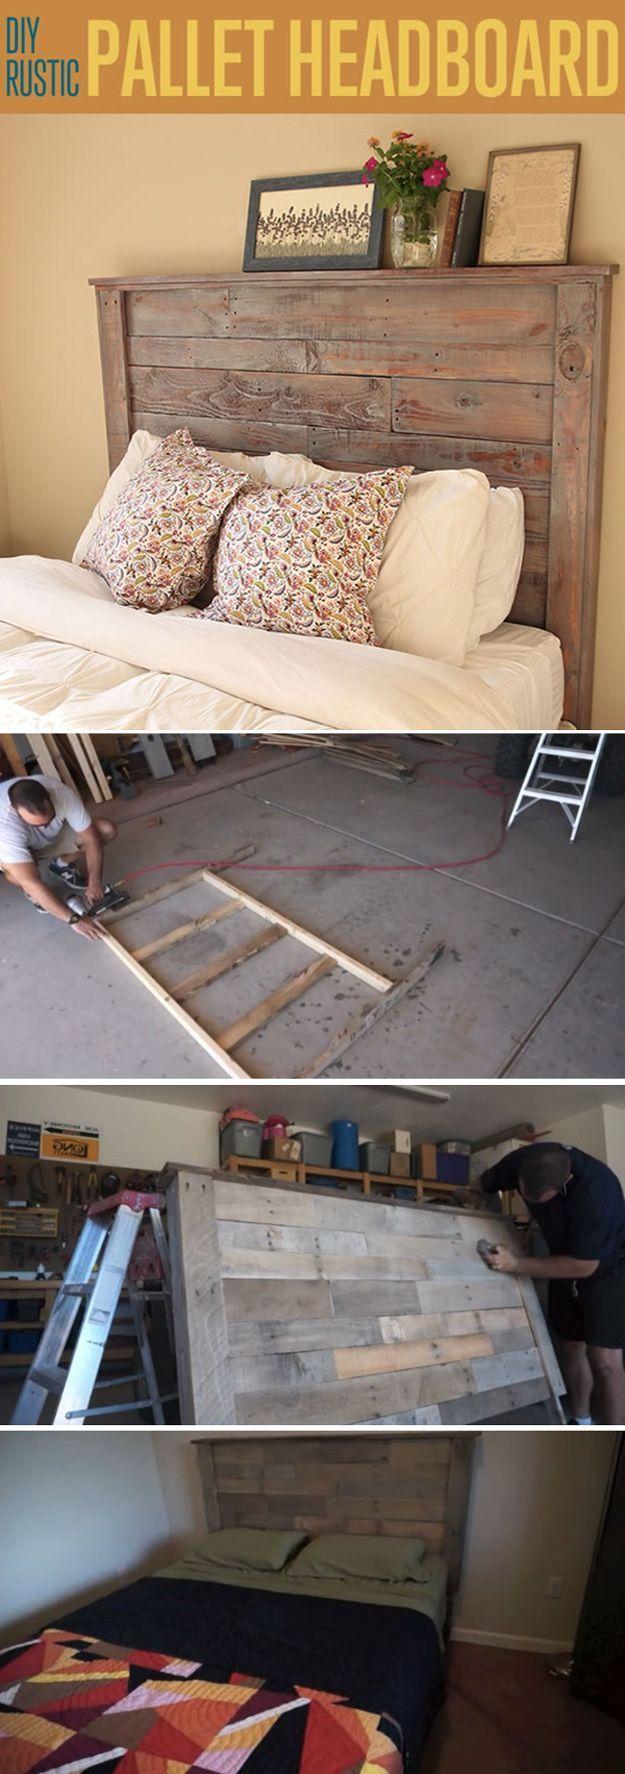 Rustic DIY Pallet Headboard Tutorial by DIY Ready at http://diyready.com/diy-headboards-for-every-home/